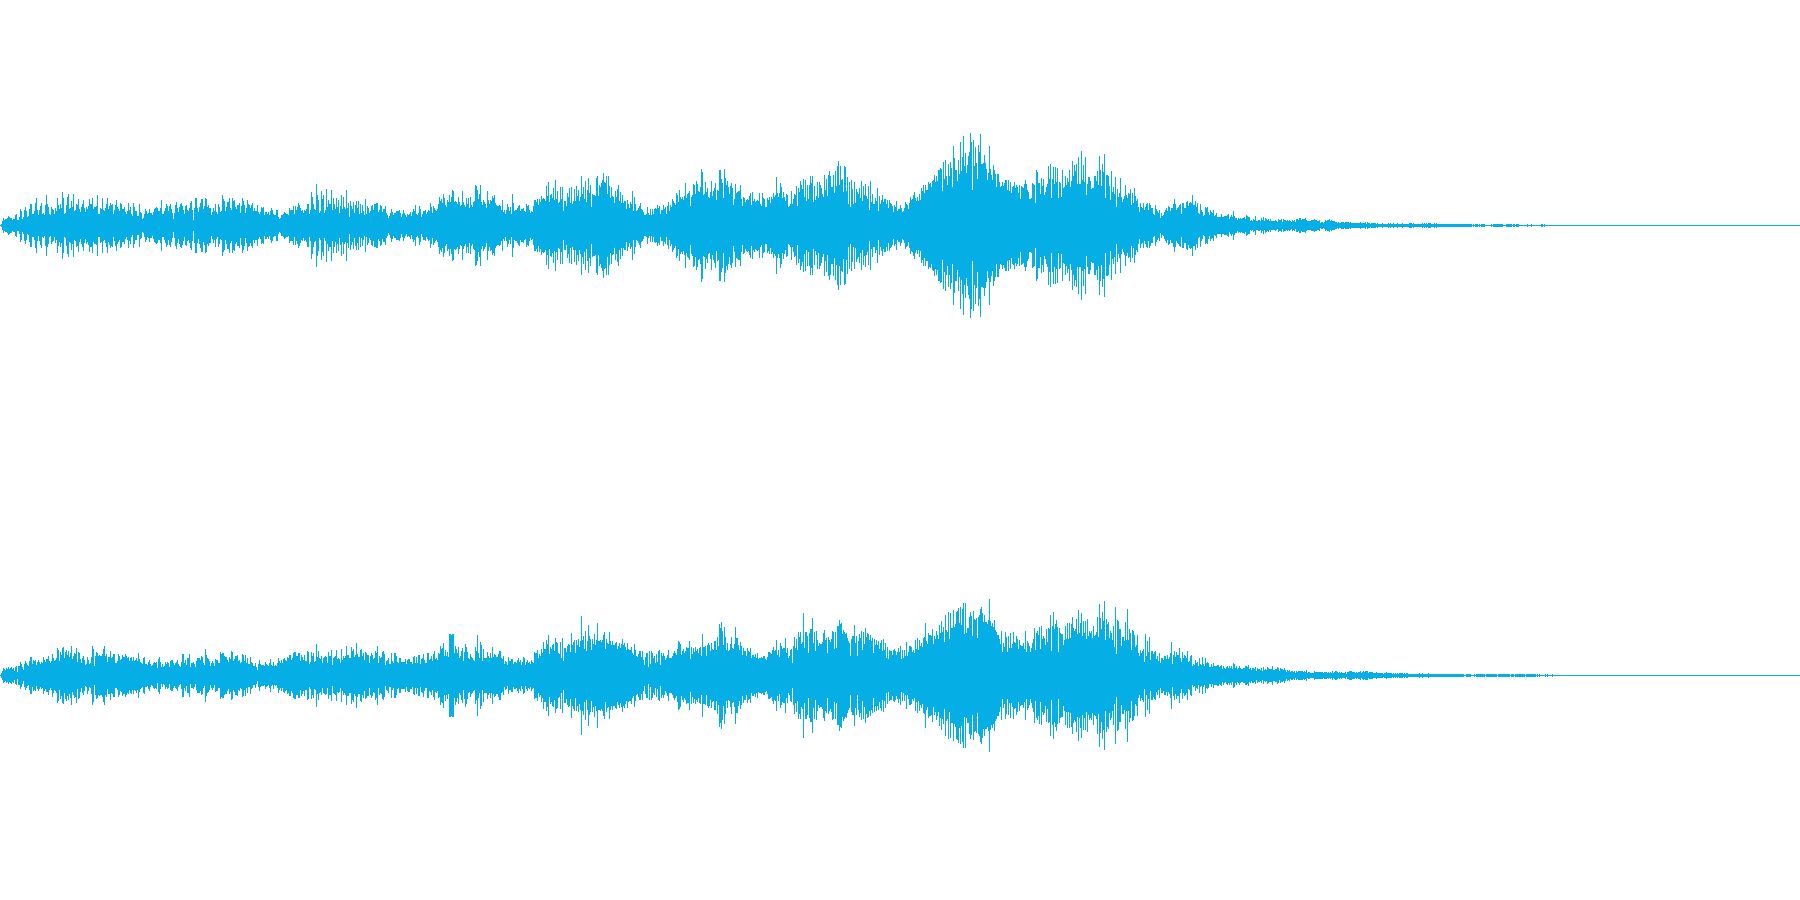 【SE 効果音】奇妙な音3の再生済みの波形